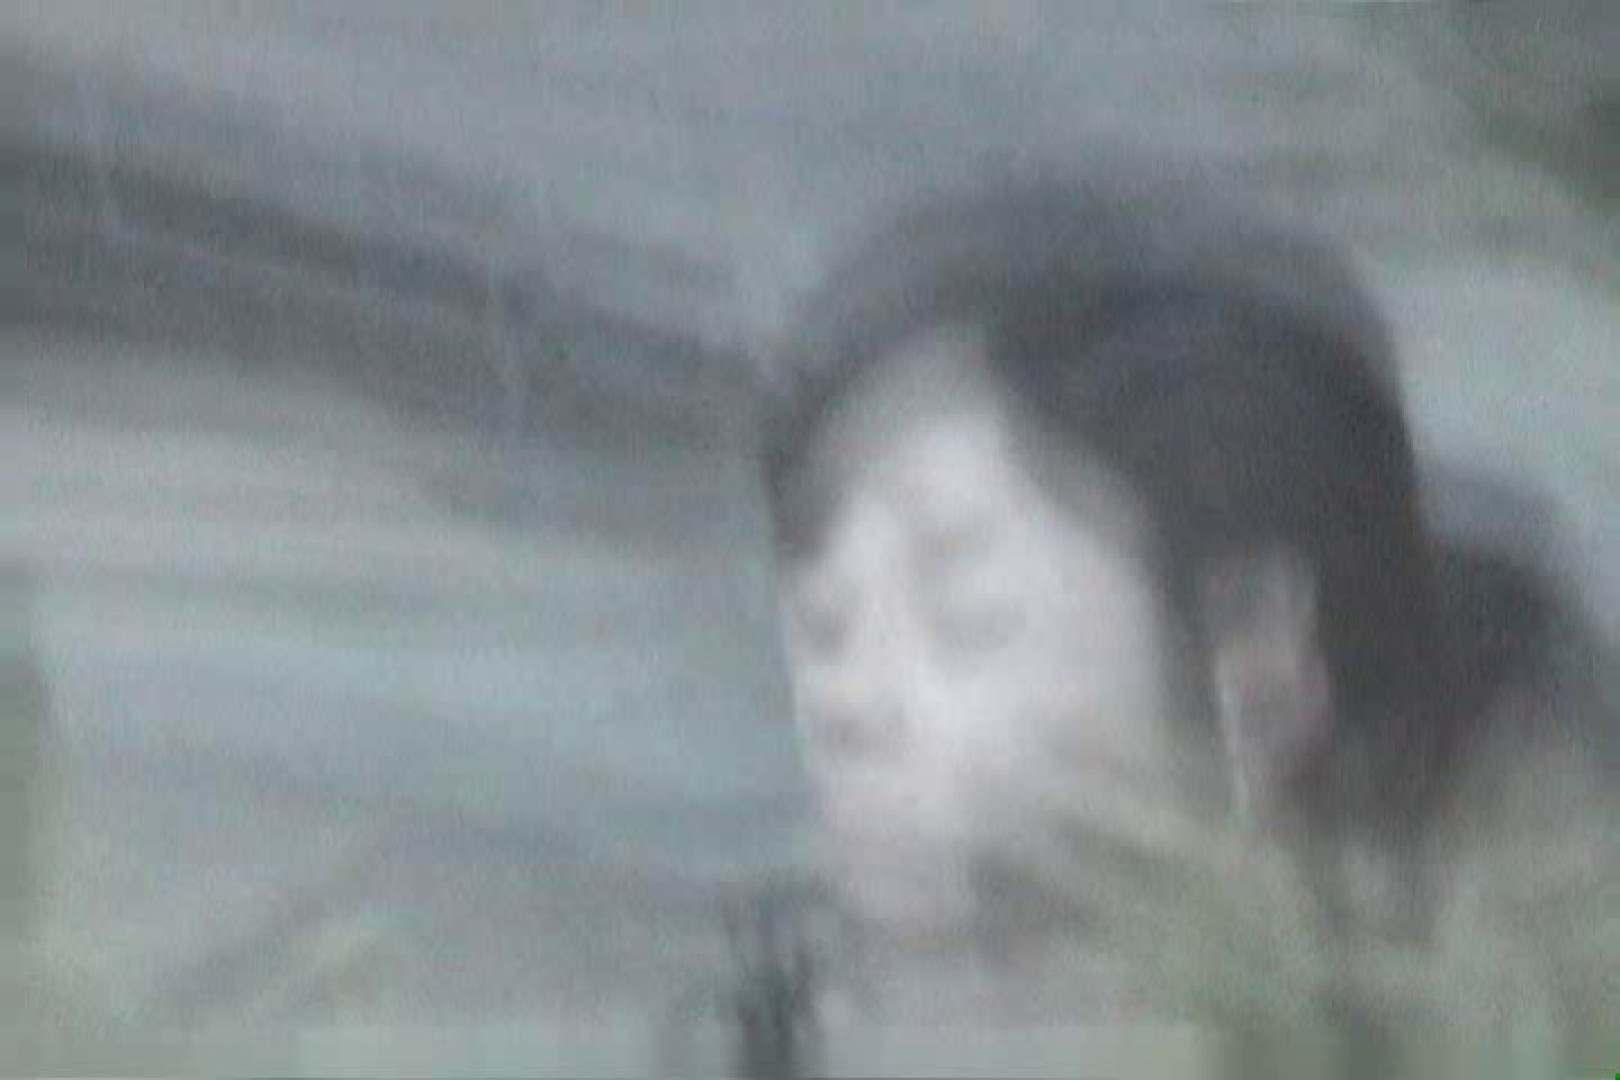 Aquaな露天風呂Vol.609 盗撮映像  58Pix 17